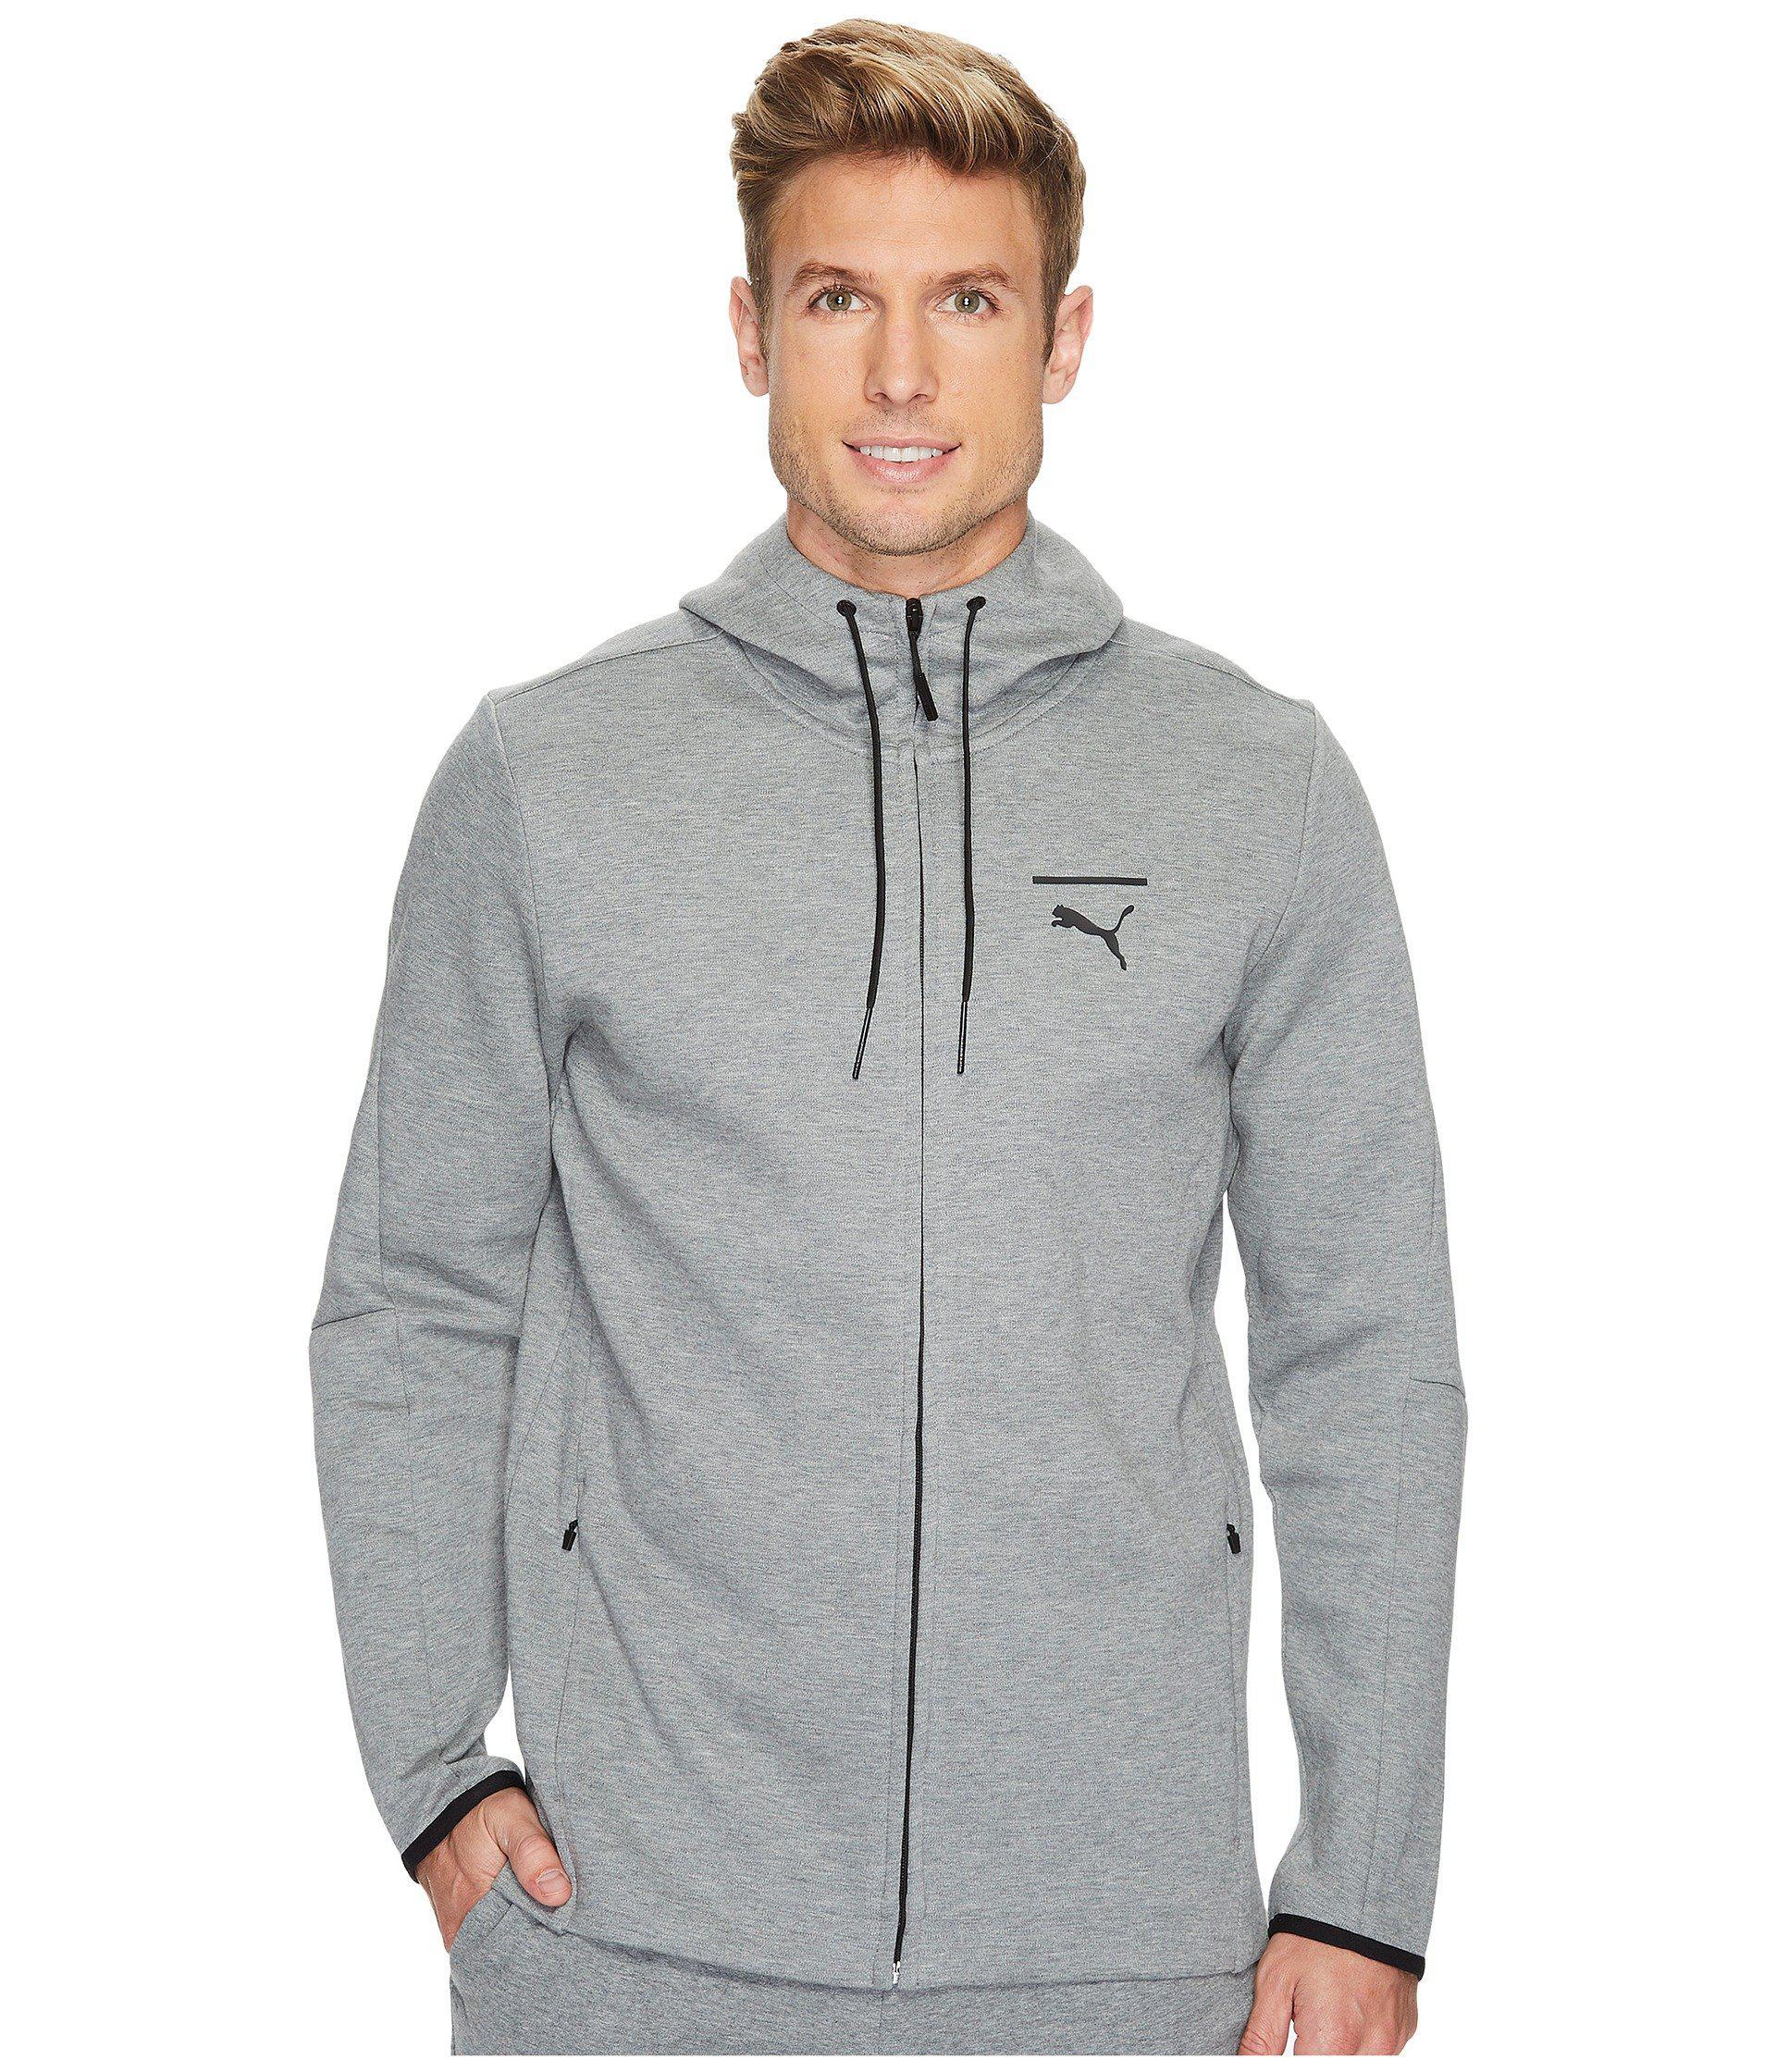 c384b183daca Lyst - PUMA Evo Core Full Zip Hoodie in Gray for Men